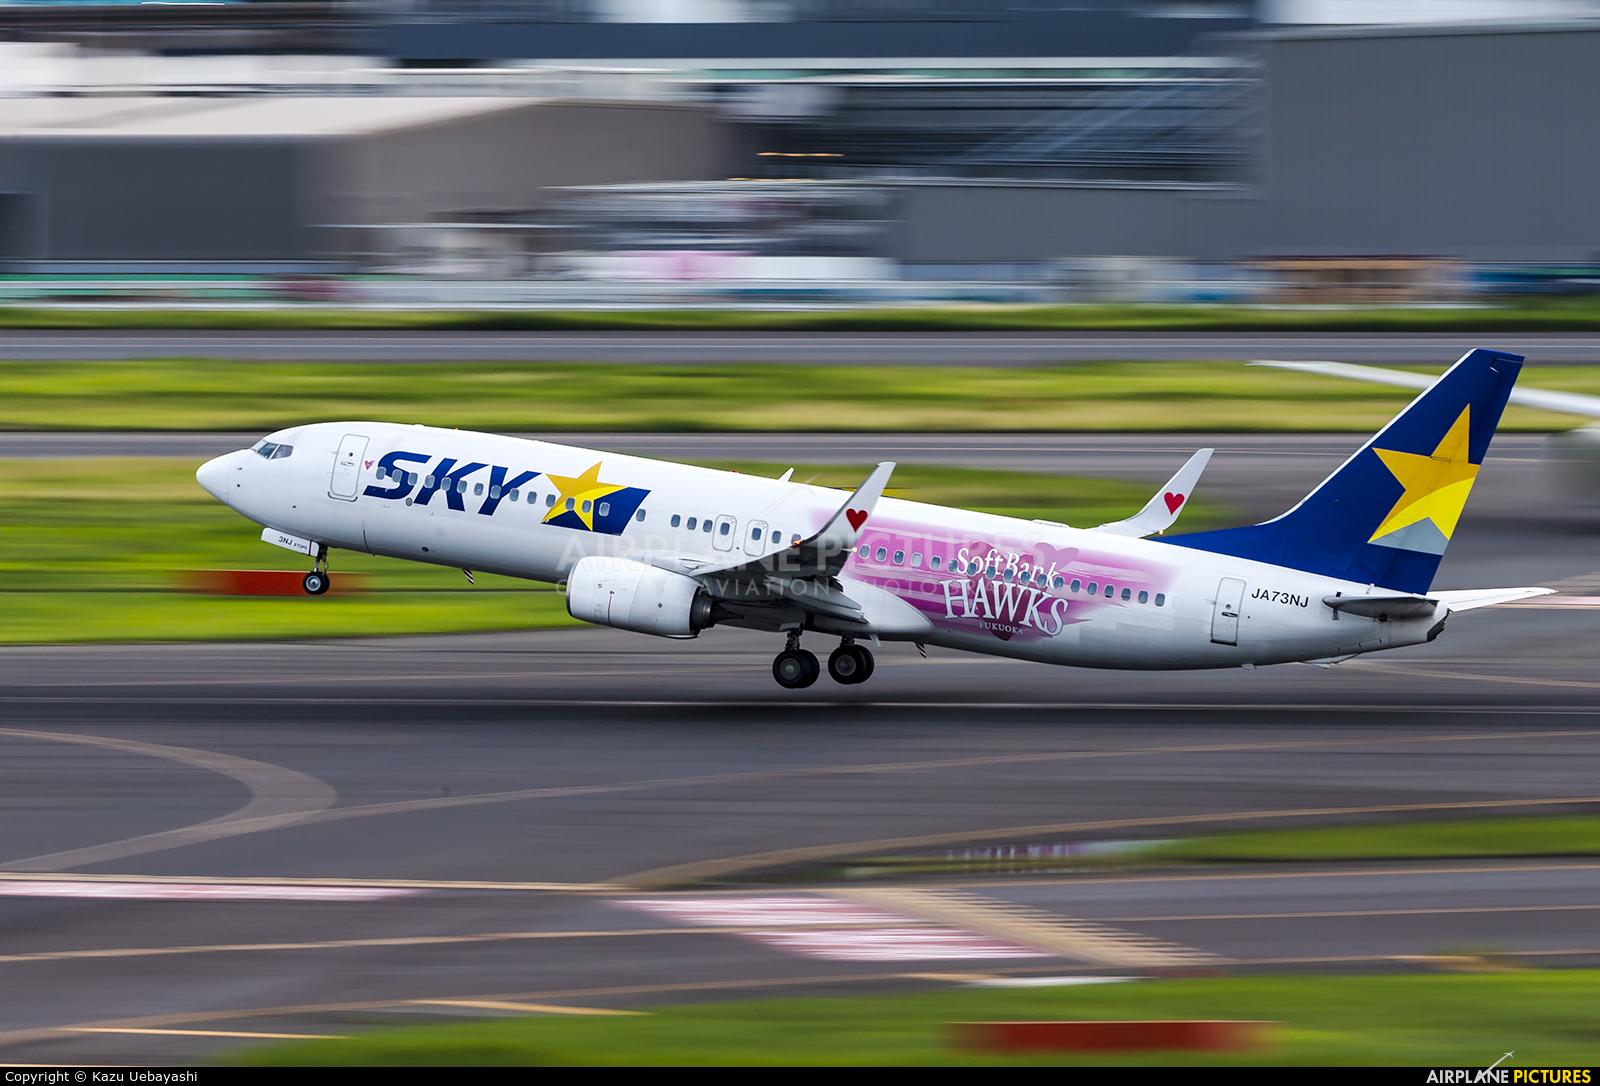 Skymark Airlines JA73 aircraft at Tokyo - Haneda Intl